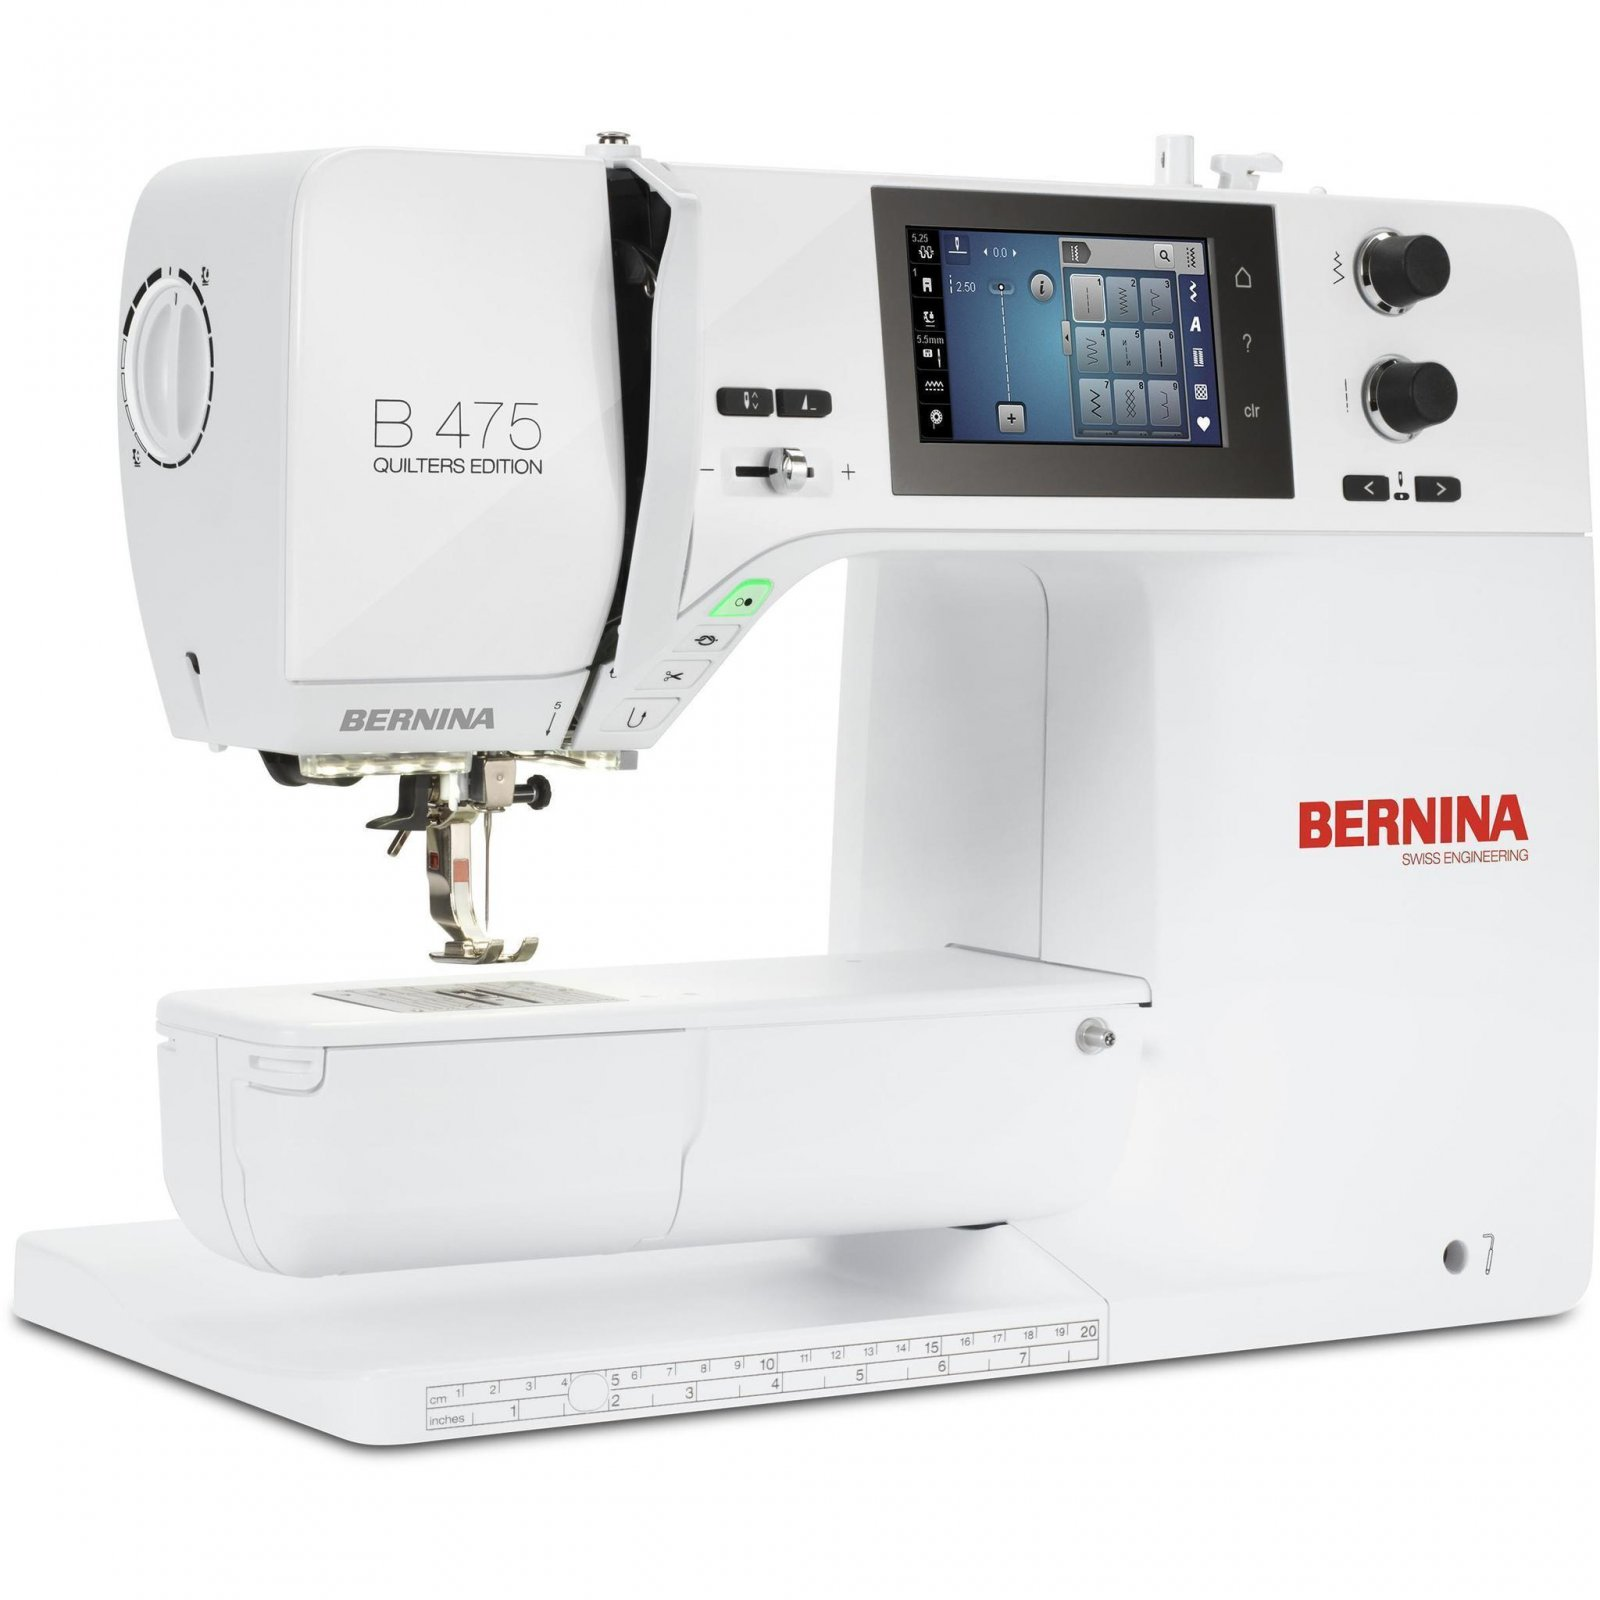 Bernina 475 Quilter's Edition